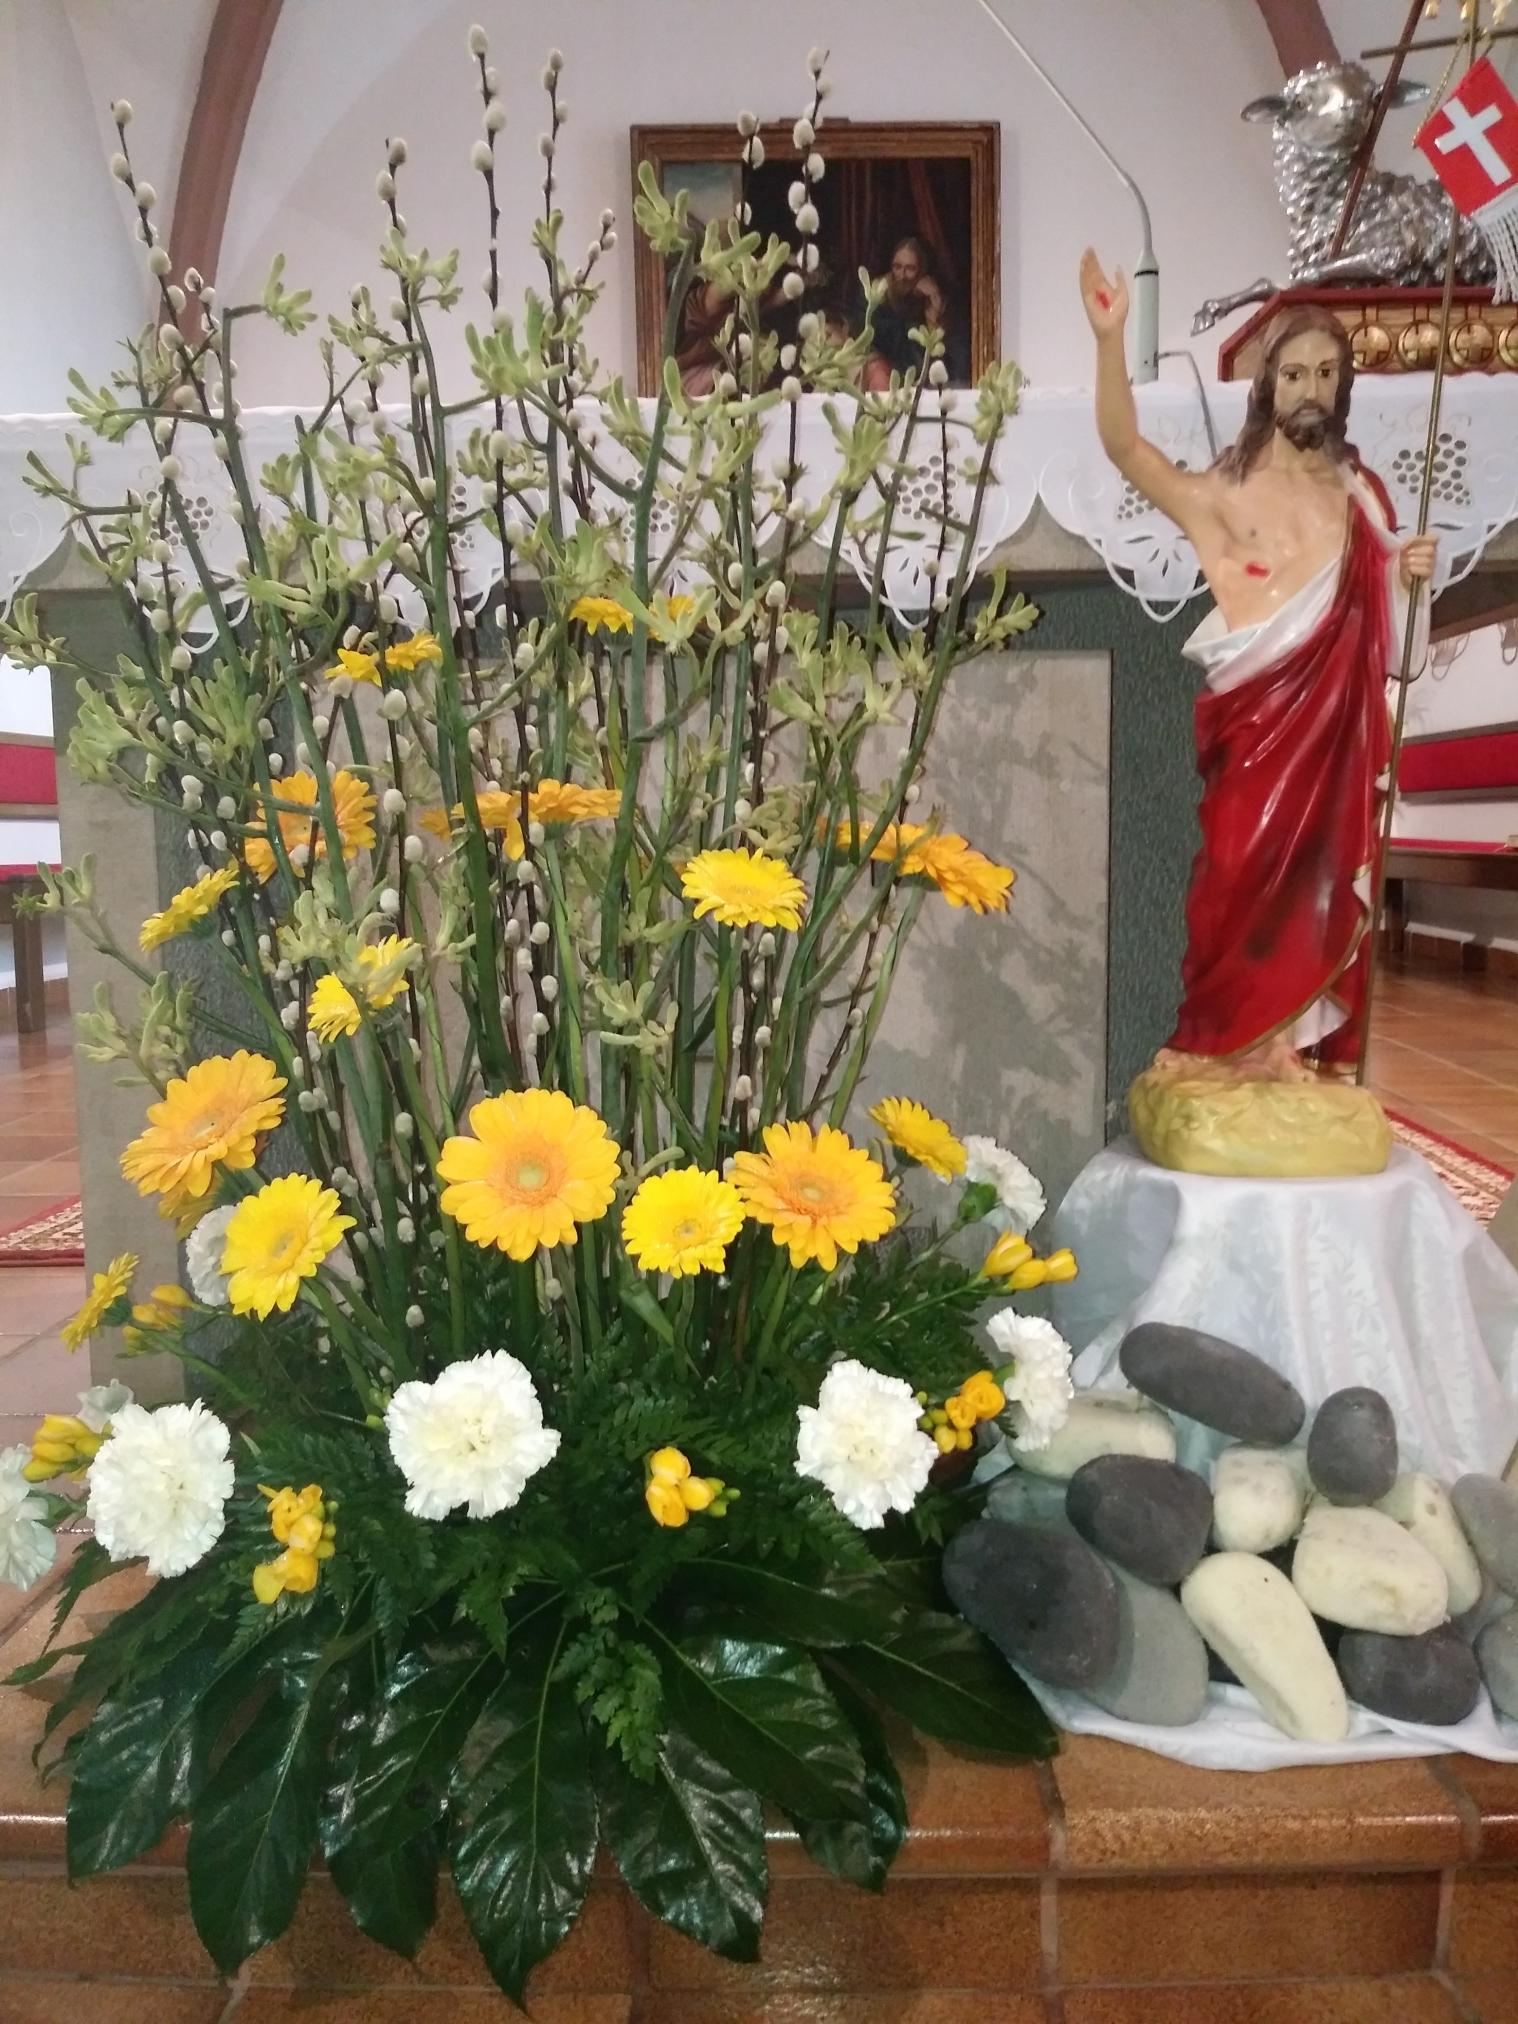 e4c8a41f4 Kostoly. Kvetinová výzdoba ...